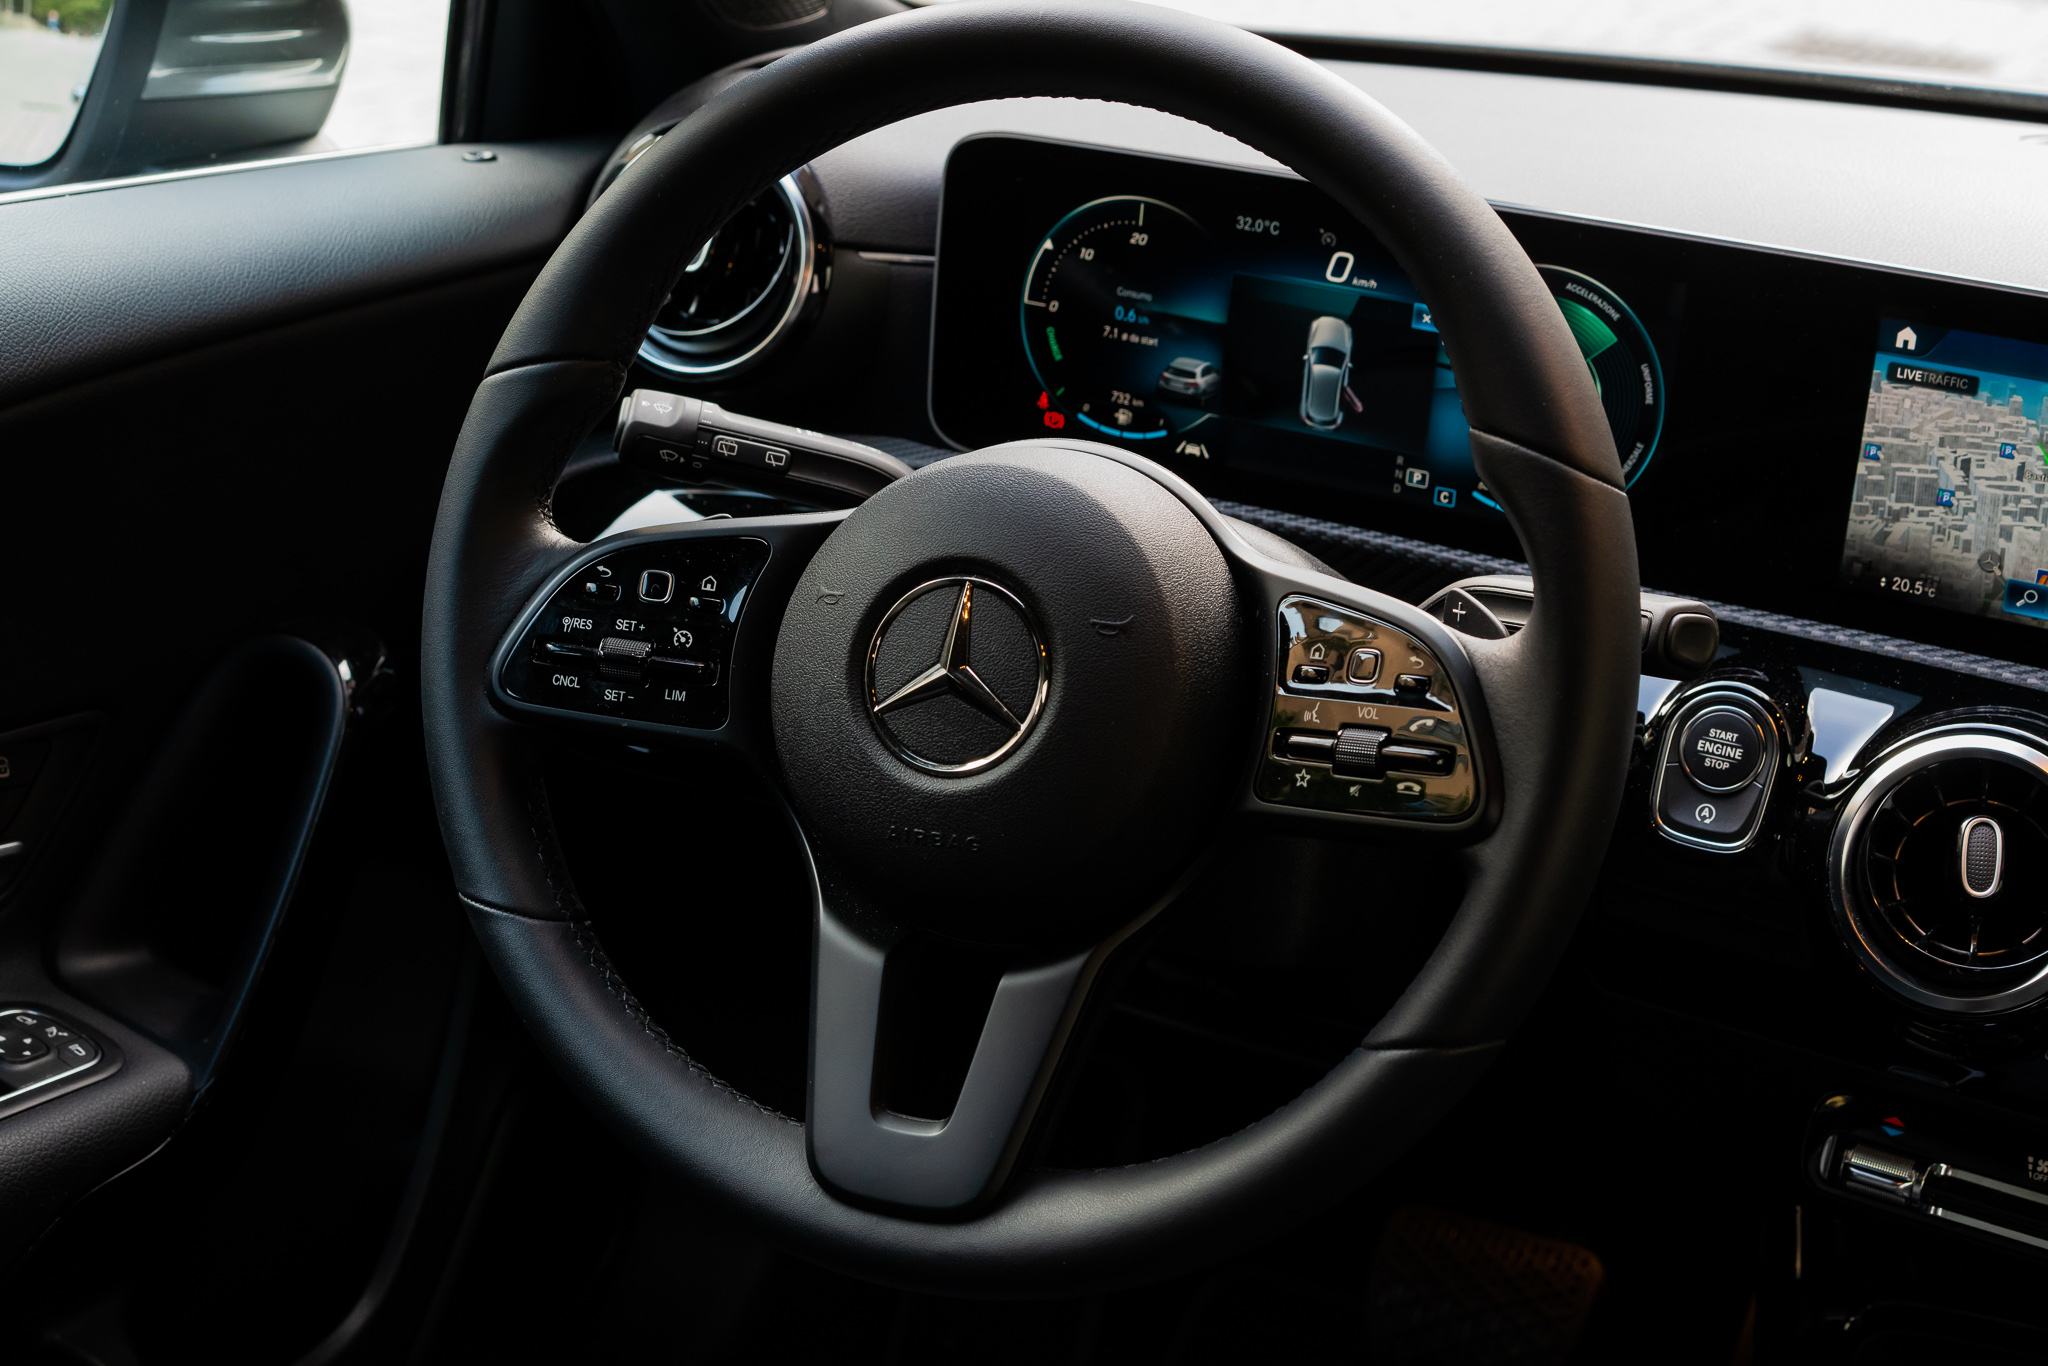 Mercedes Classe A volante